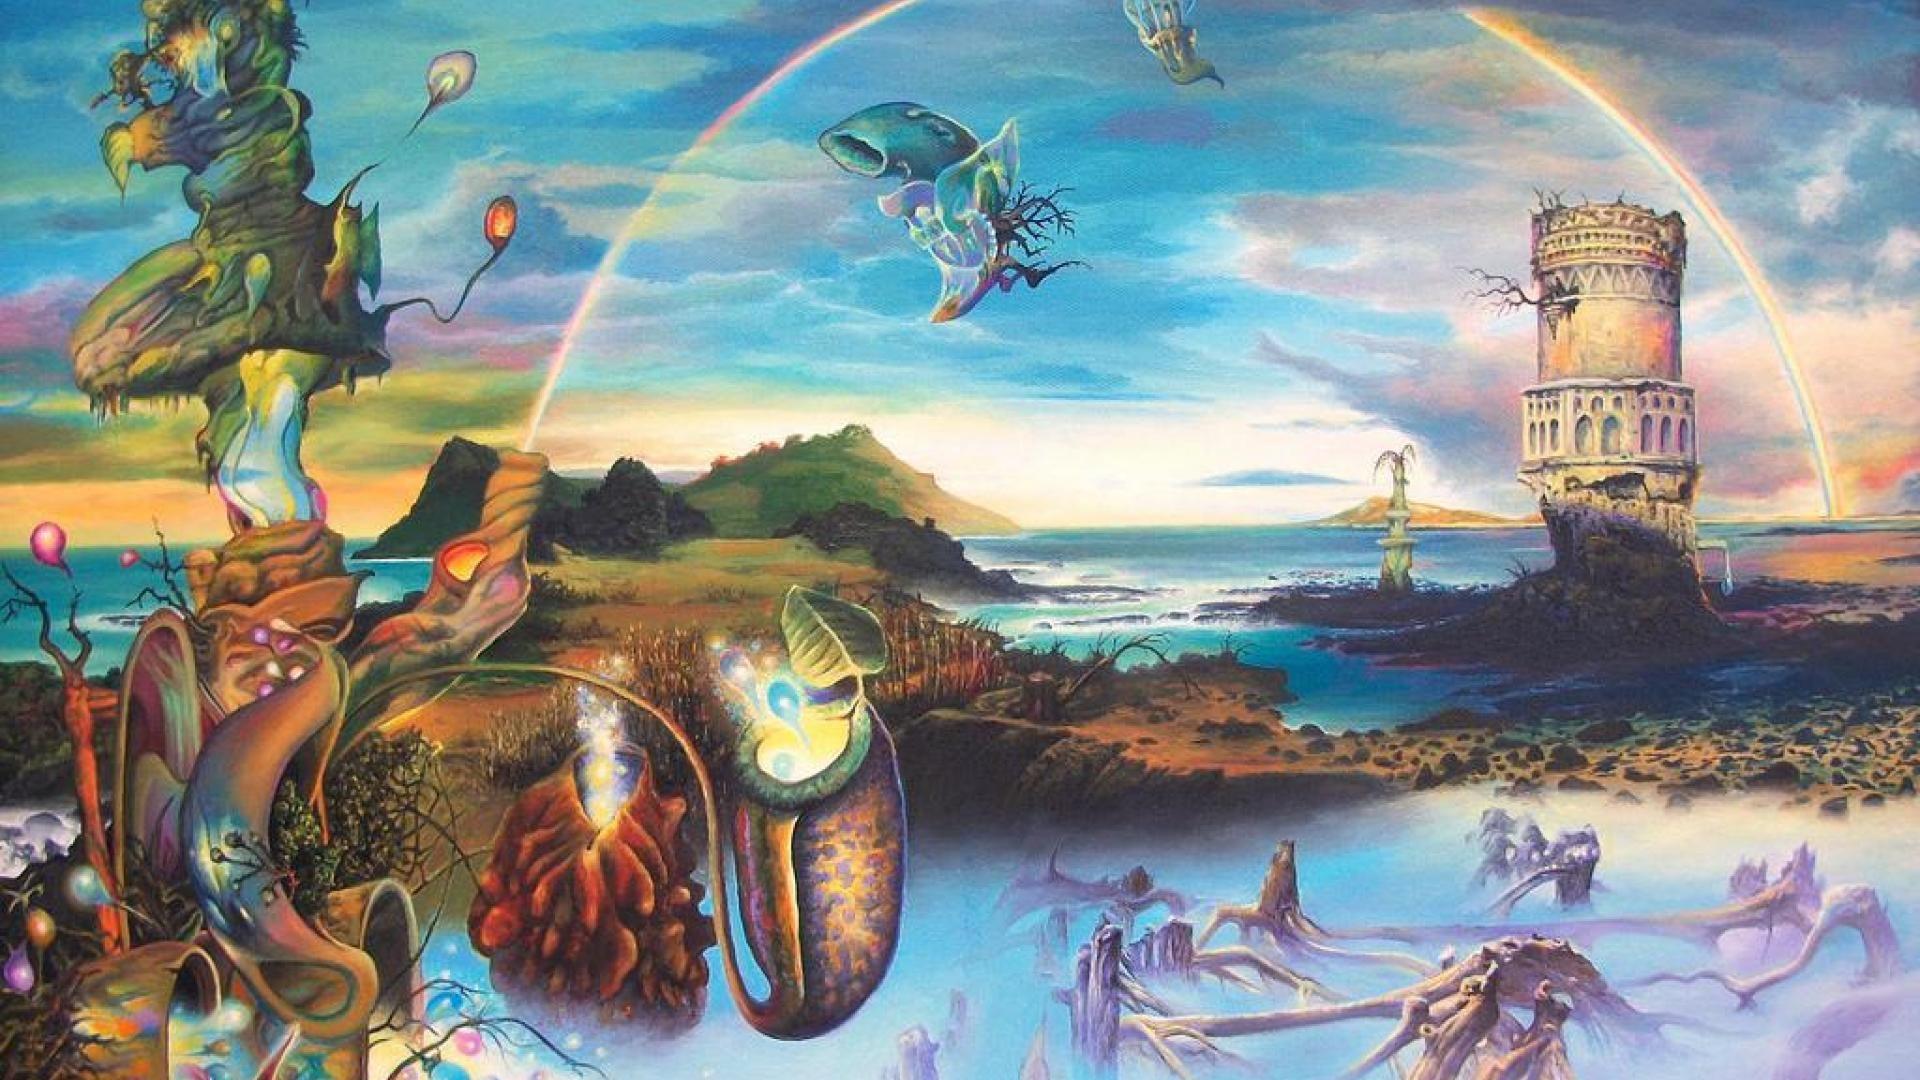 surreal wallpaper | cool kids | pinterest | surreal art and surrealism